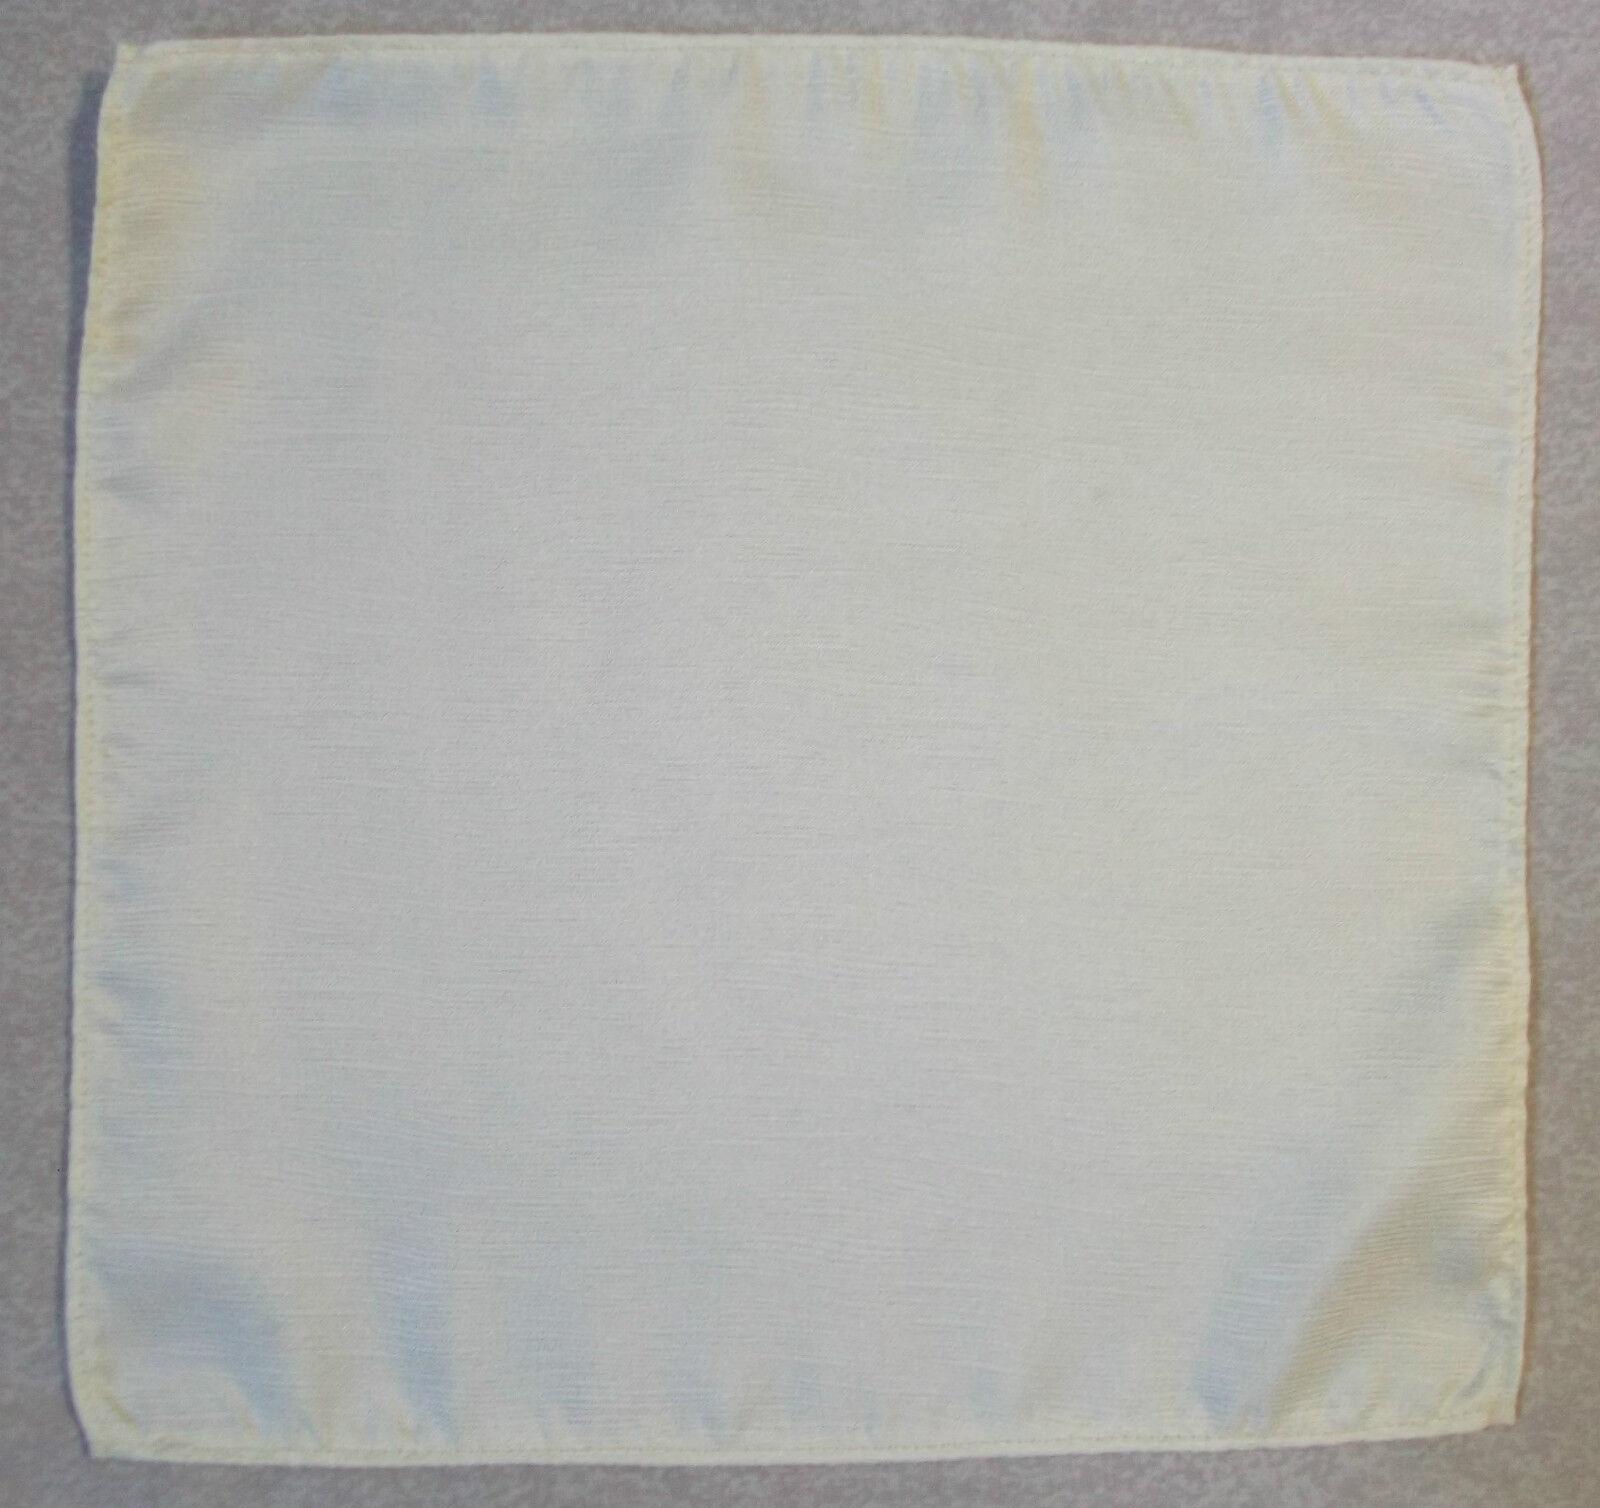 Handkerchief MENS Hankie Top Pocket Square Wedding Fashion Party LEMON YELLOW